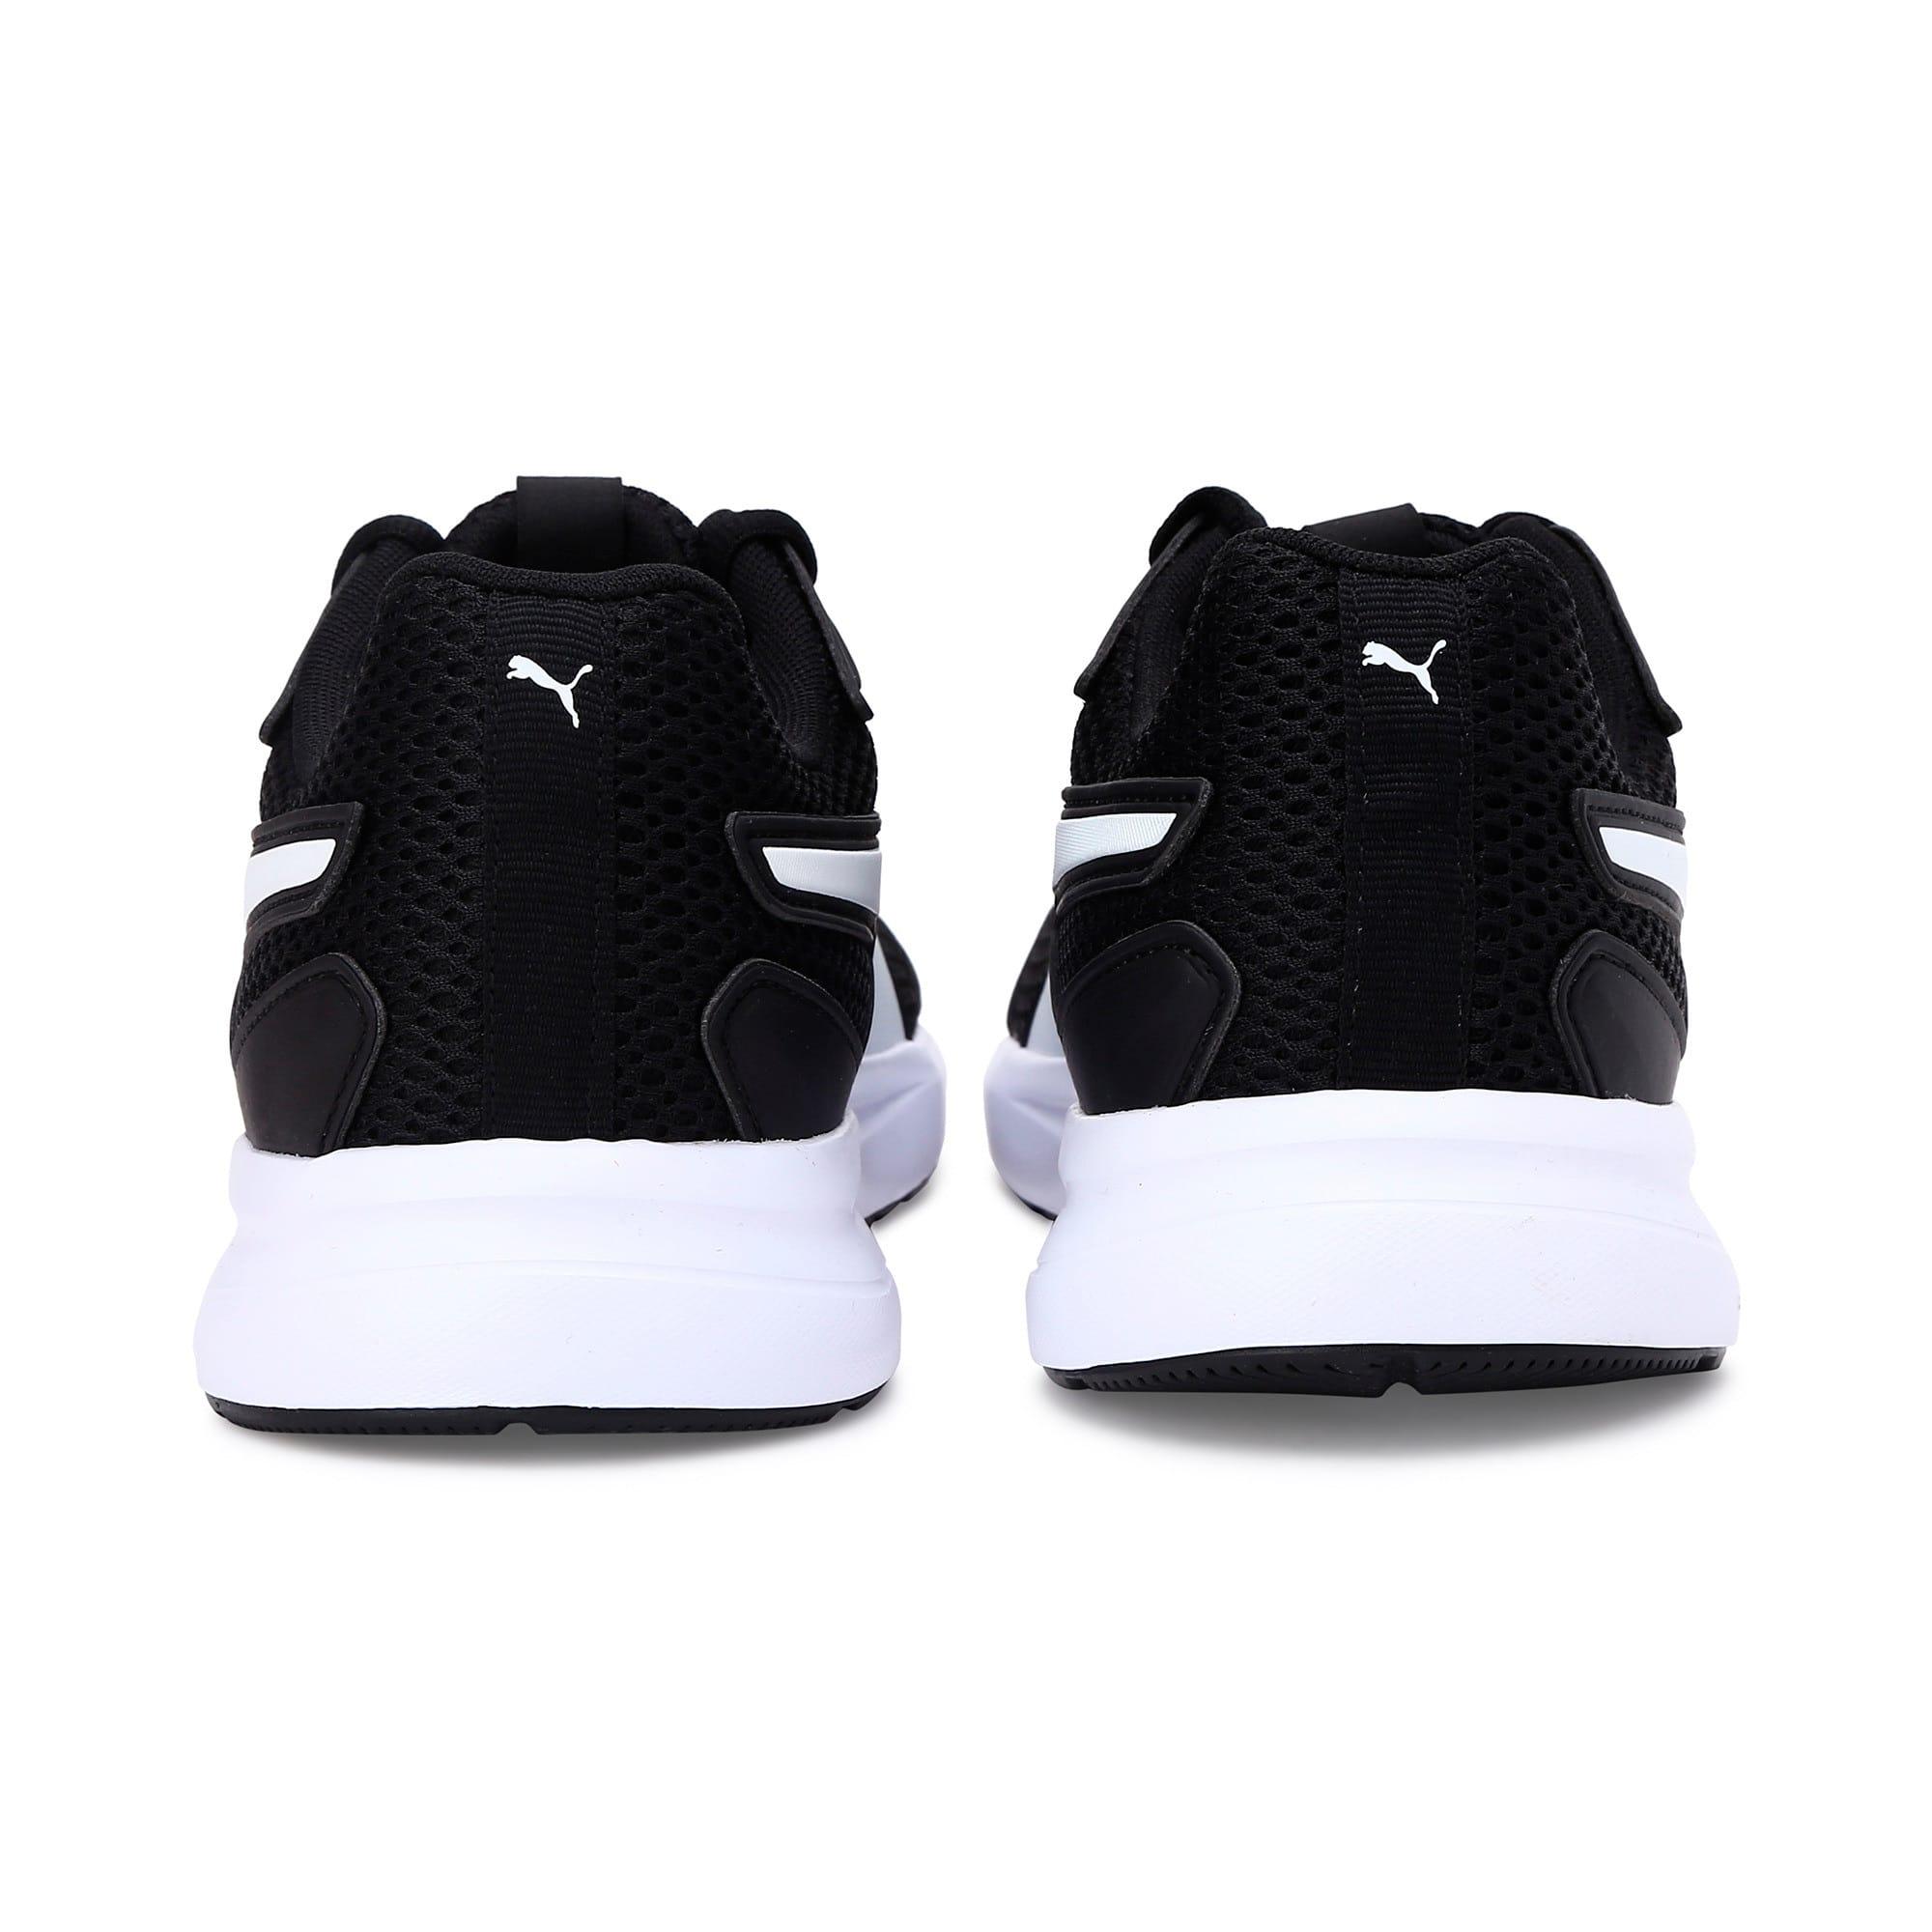 Thumbnail 3 of Escaper Training Shoes, Puma Black-Puma White, medium-IND